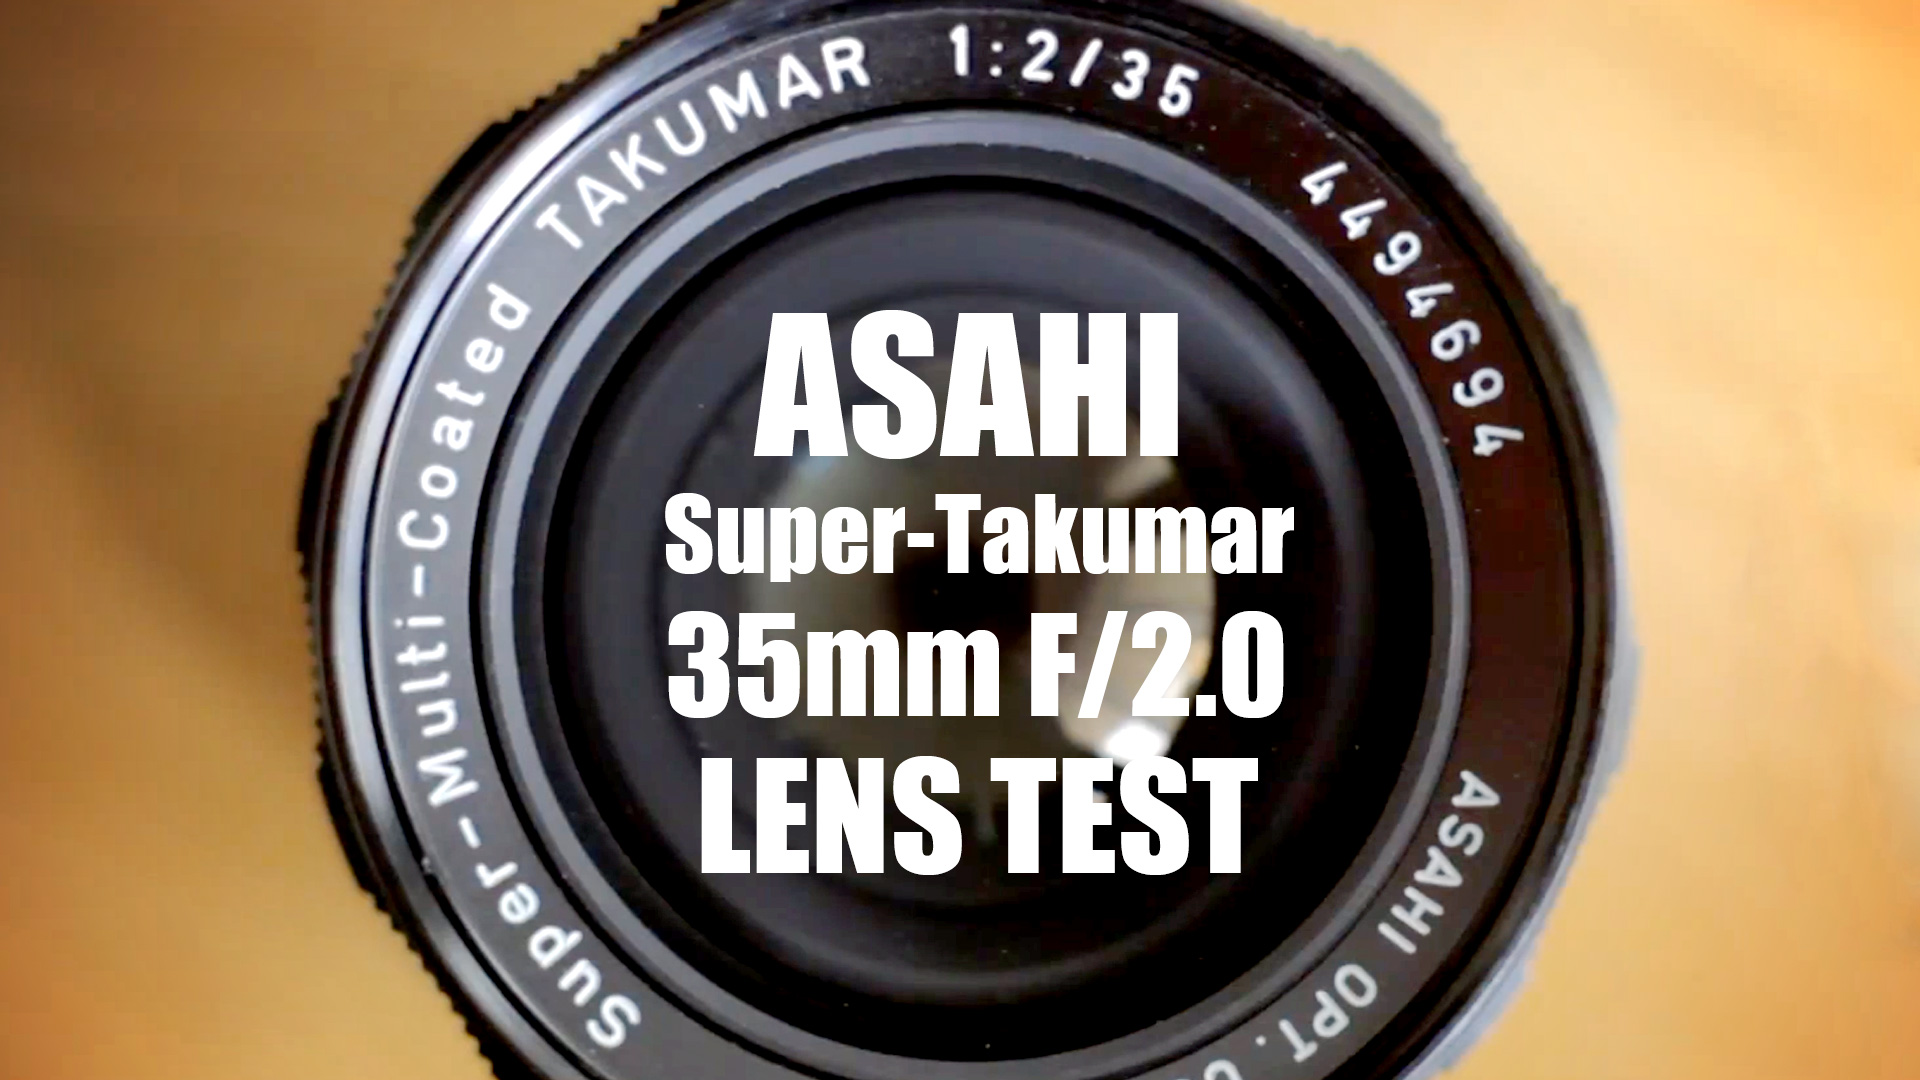 Asahi Super-Takumar 35mm f/2.0 Lens Test